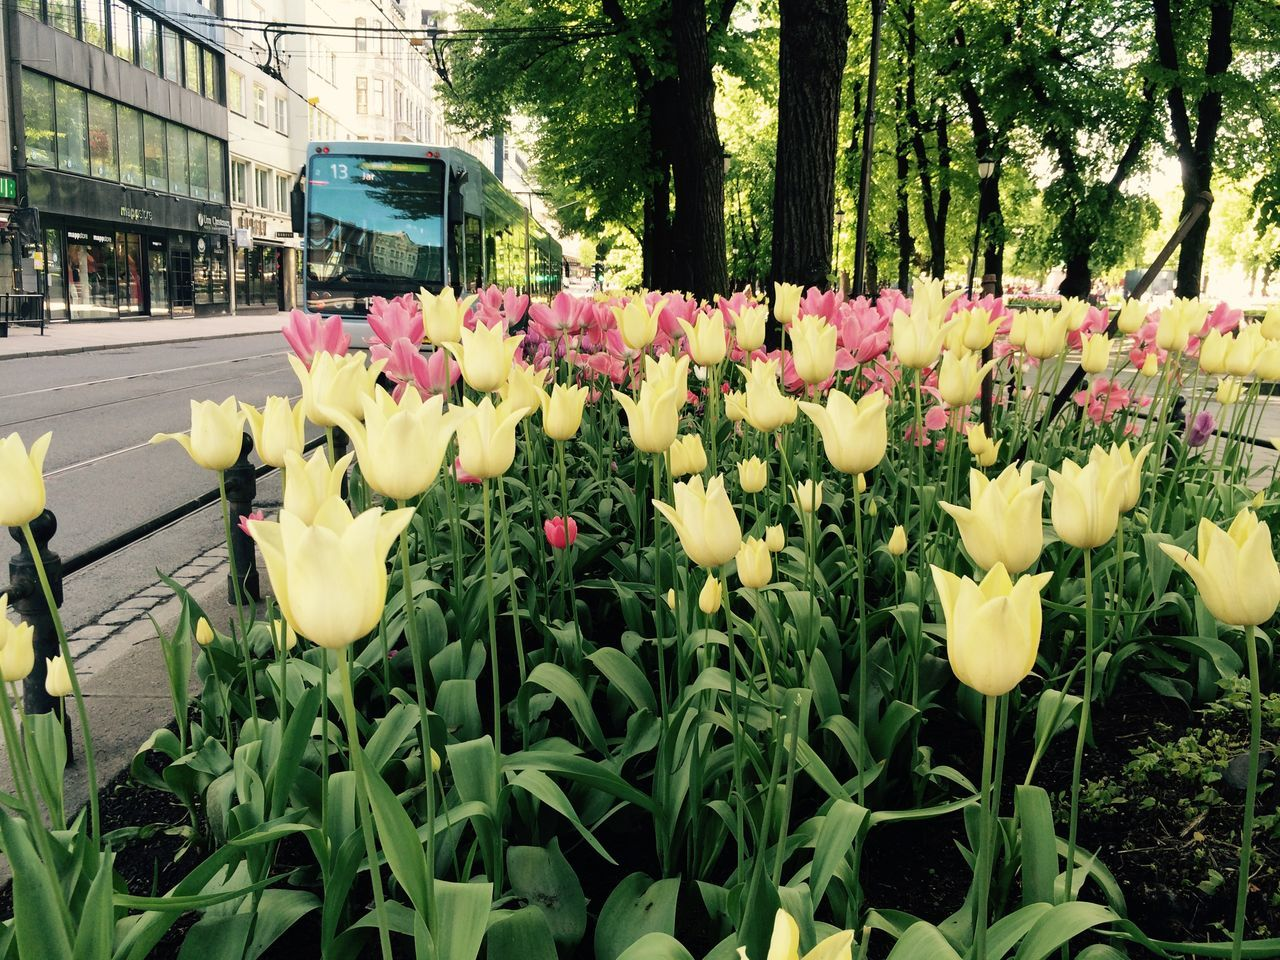 Spikersuppa 13 Trikken Tulips Summer Norway Public Transportation Tram